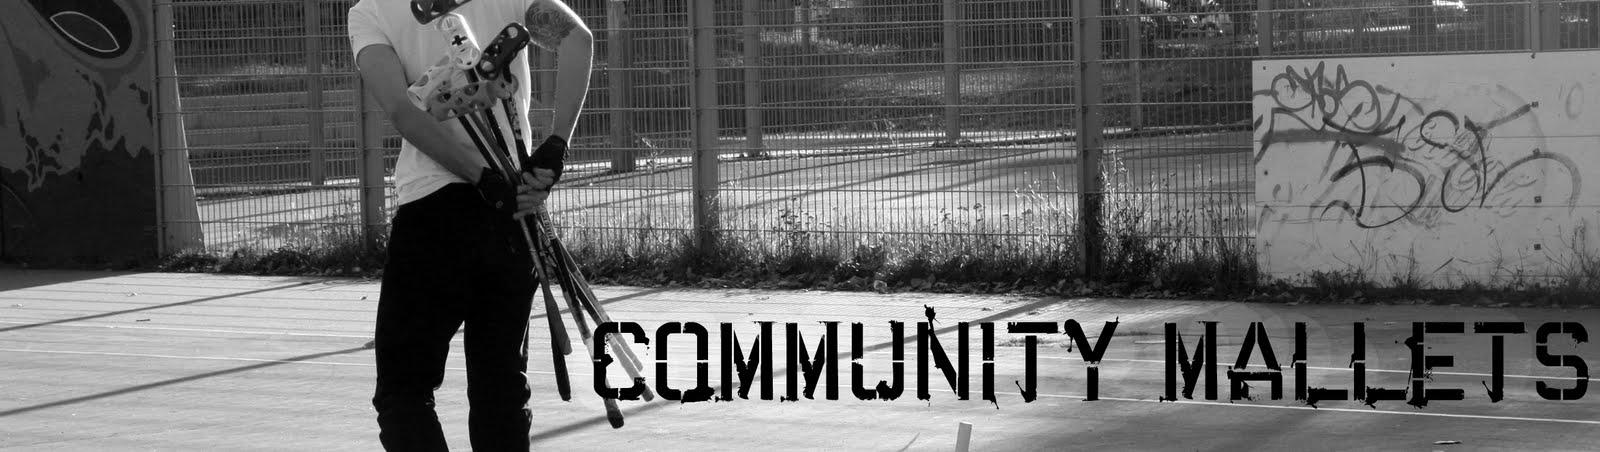 Community Mallets